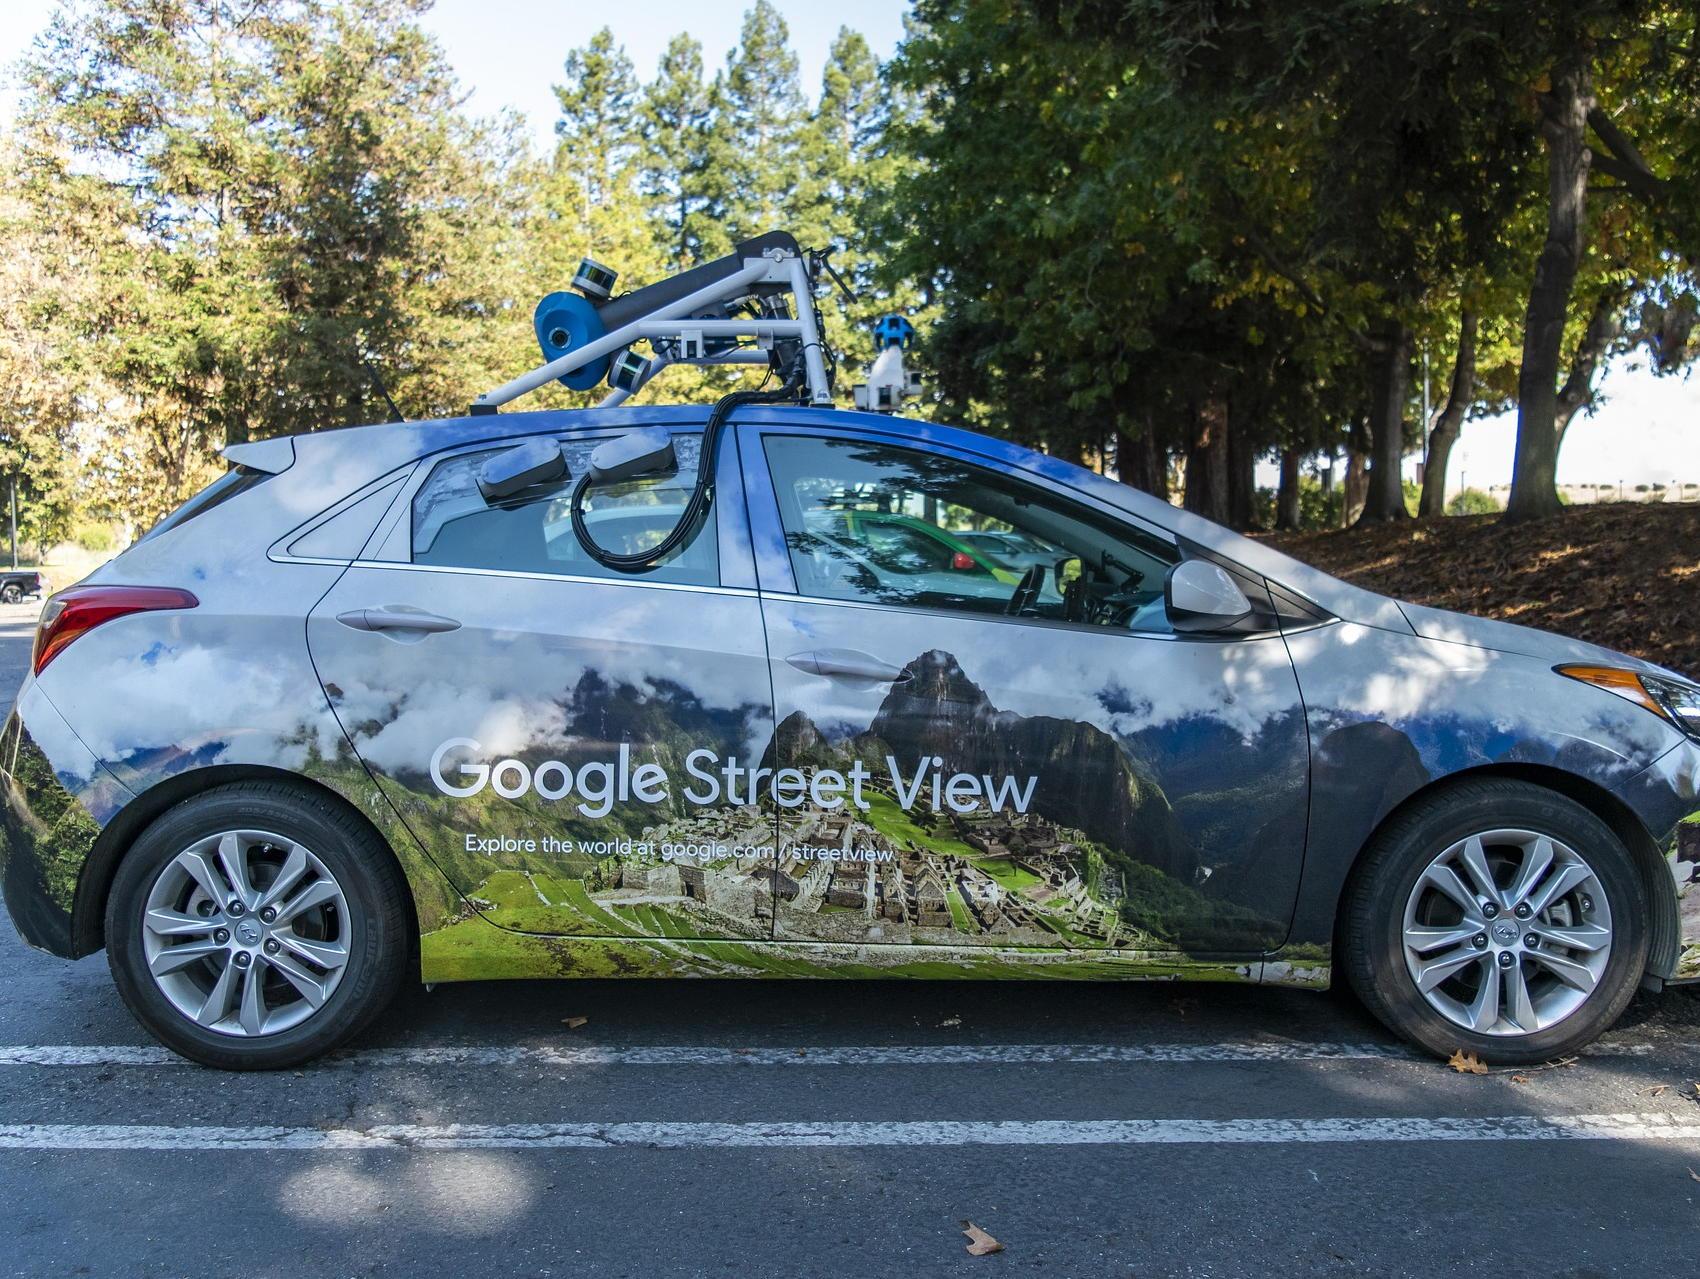 Google Maps Street View Car - Image by Daniel and Jacob Fernandez